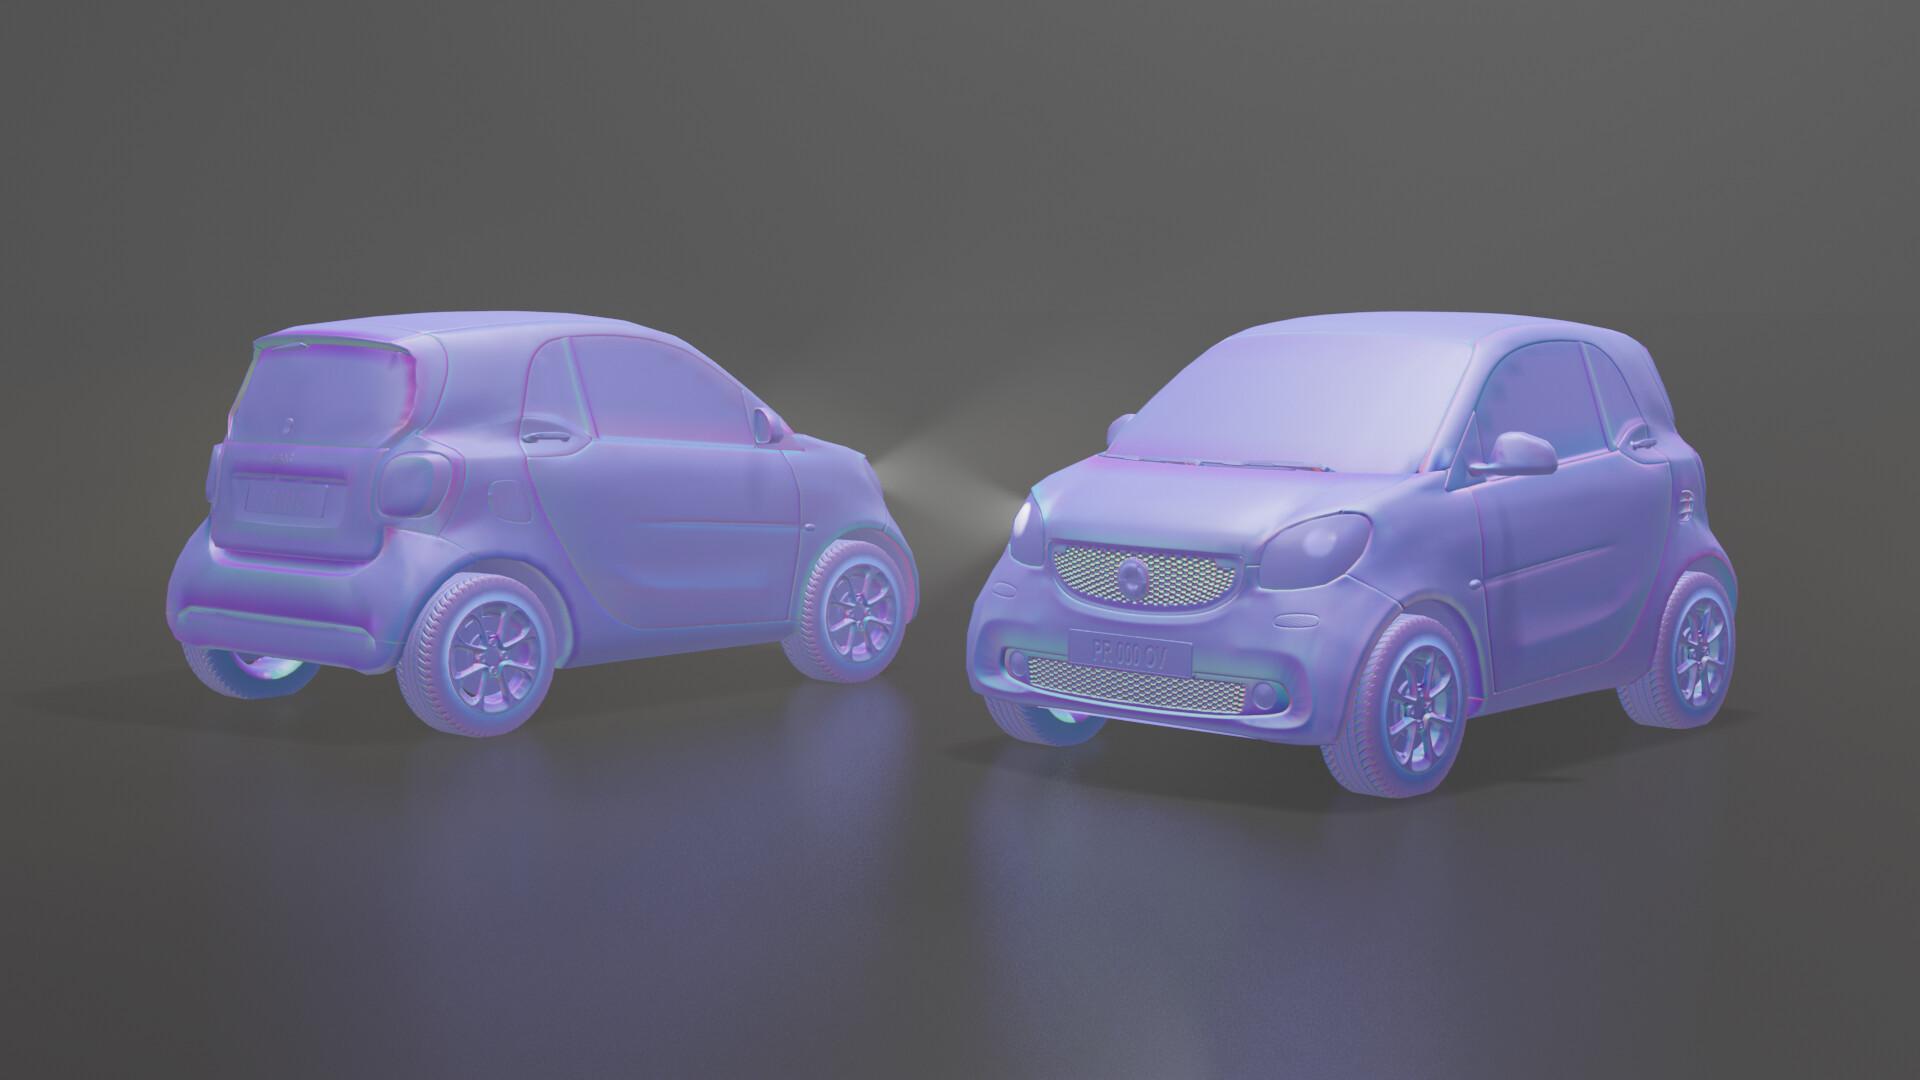 Artstation Low Poly Car Smart Fortwo In Blender Eevee Simone